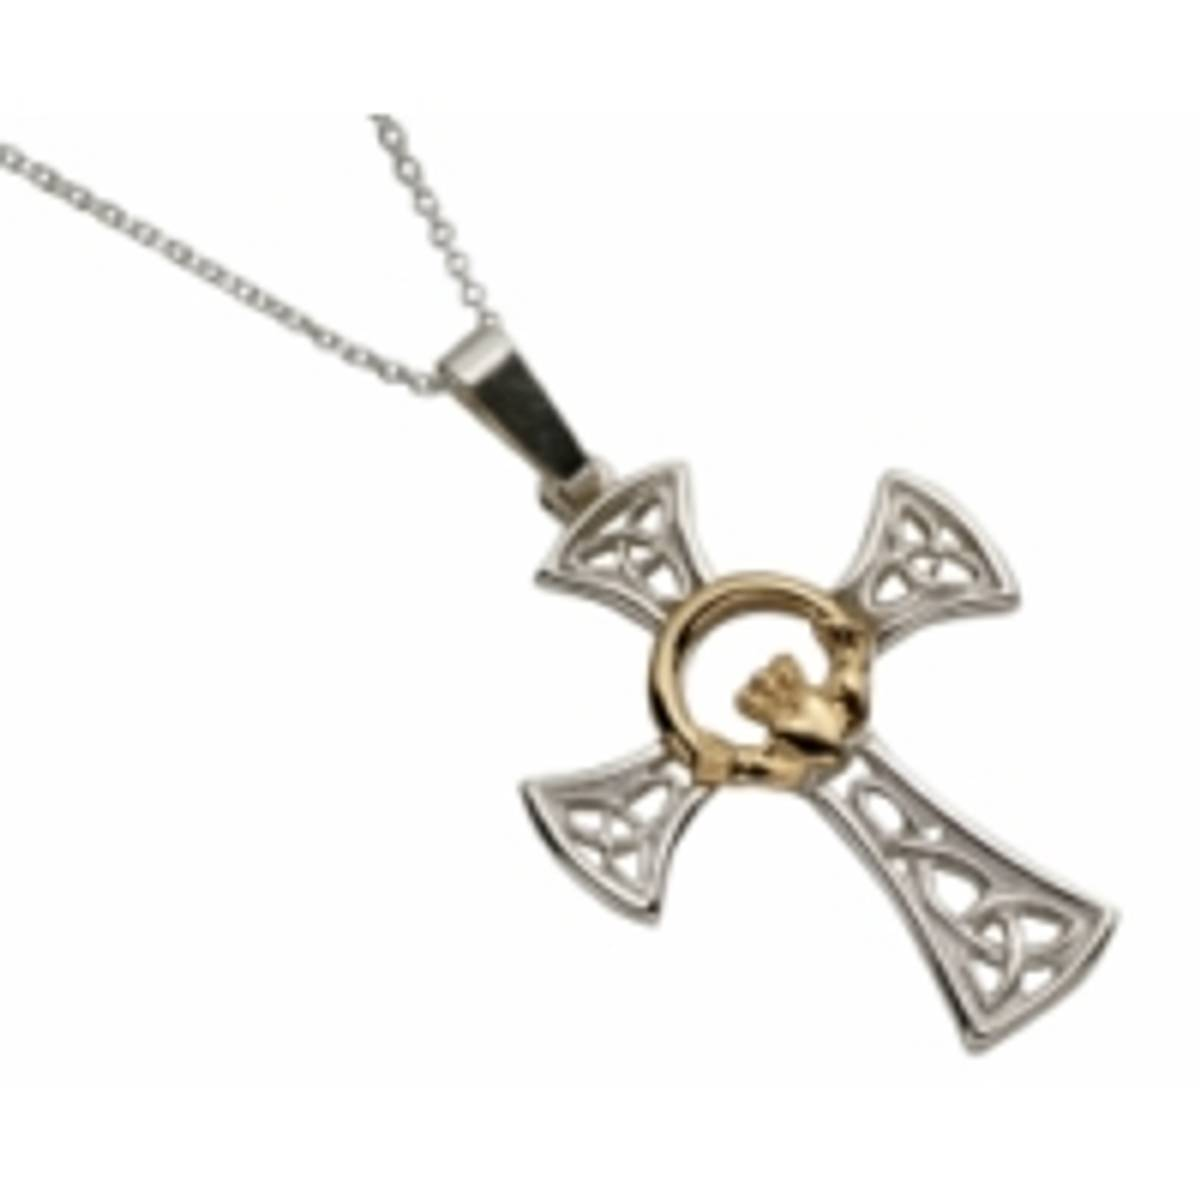 Silver filigree Celtic cross pendant with 10 carat yellow gold Claddagh motif.